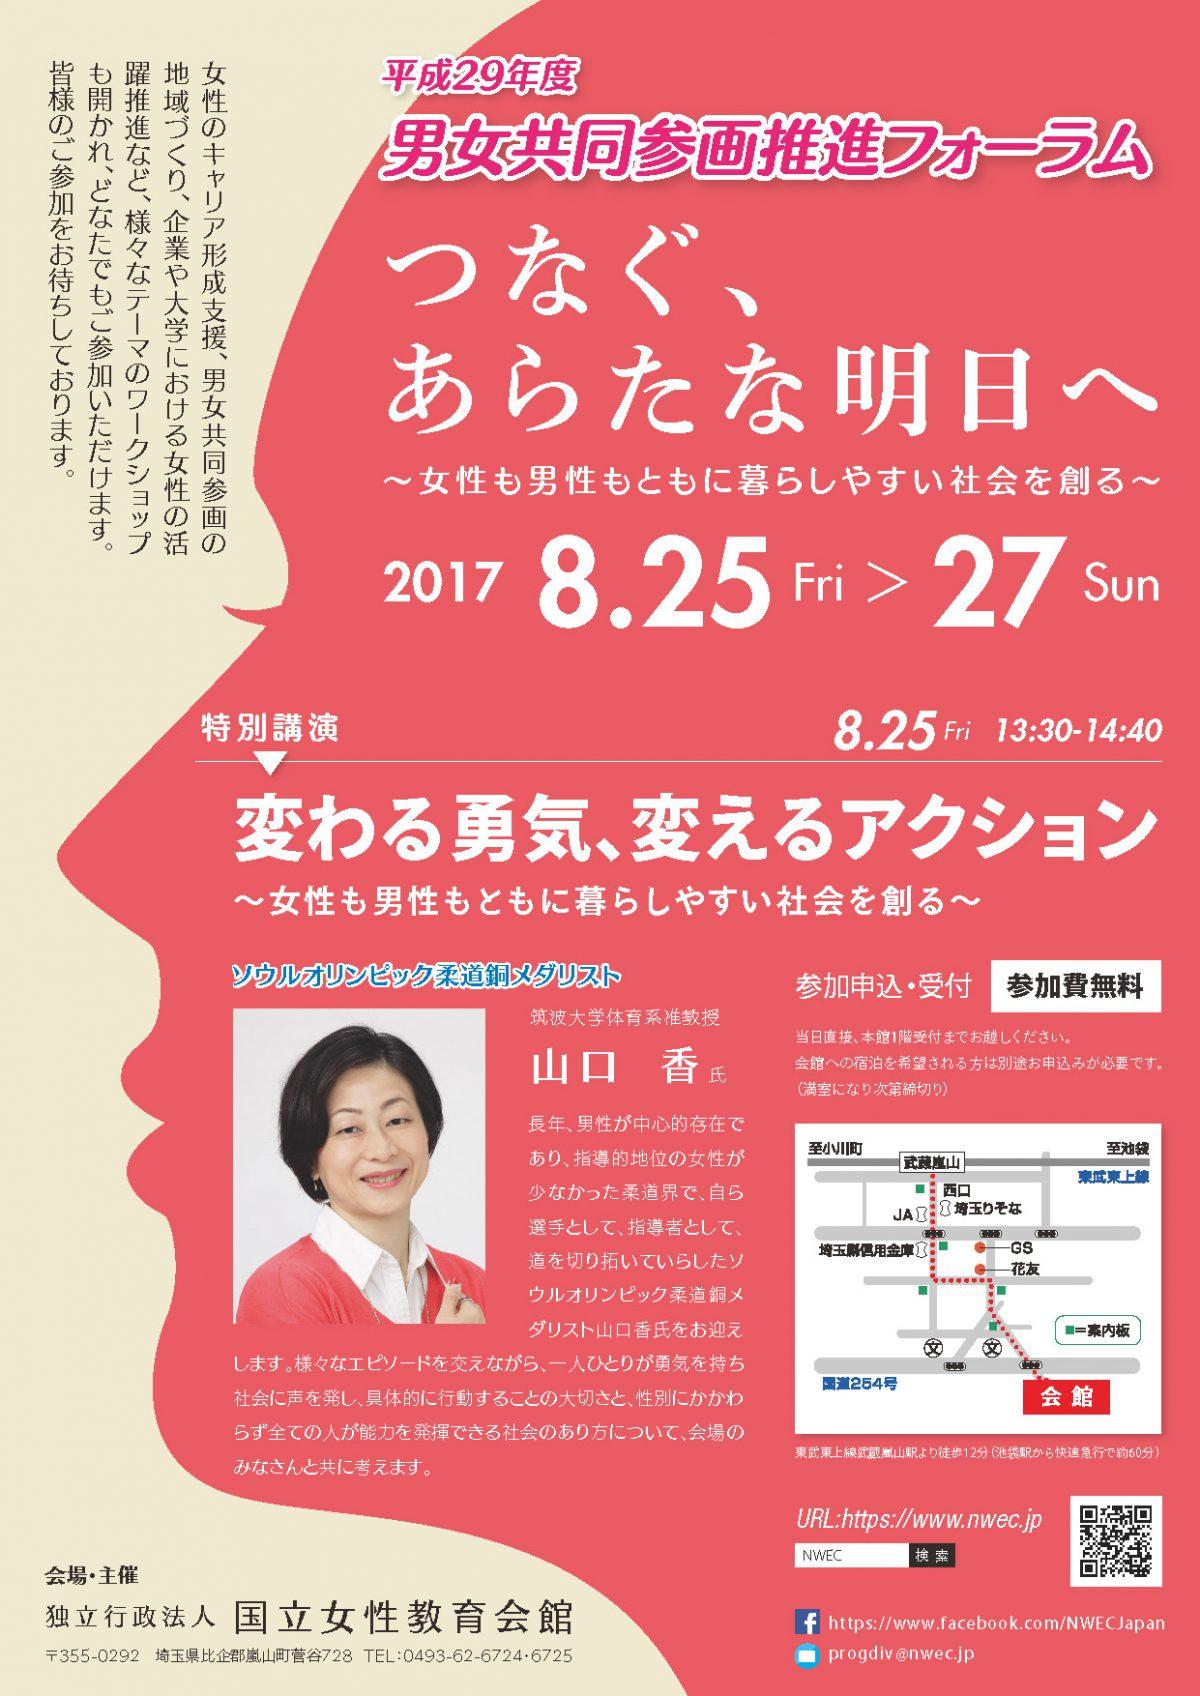 8/26、NWEC平成29年度「男女共同参画推進フォーラム」で多賀太が登壇します